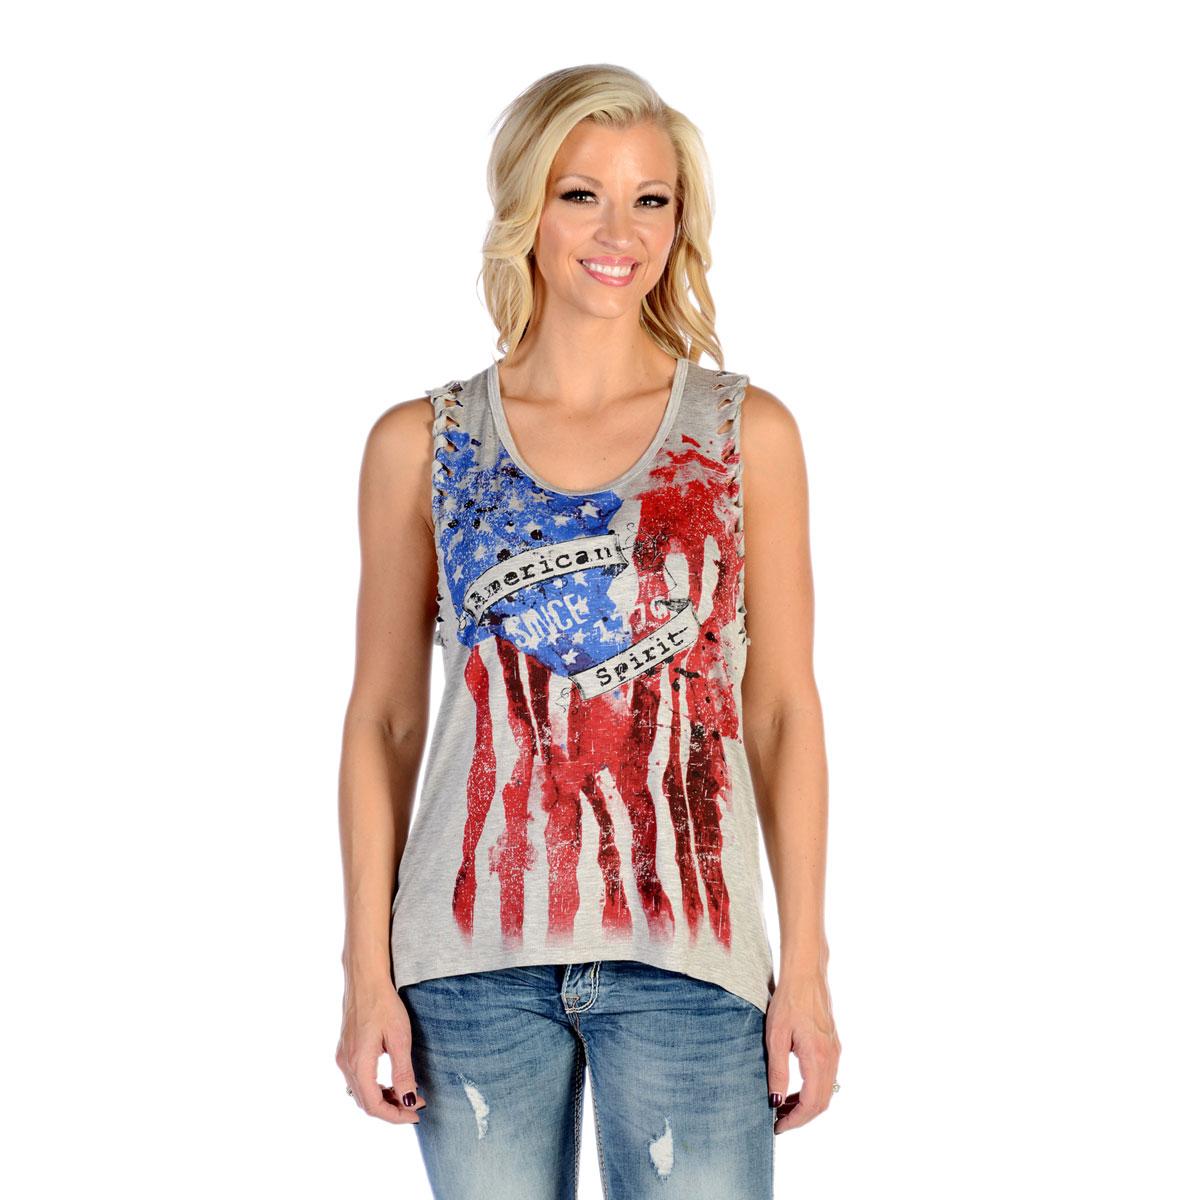 Liberty Wear Women's American Spirit Heather Gray Tank Top